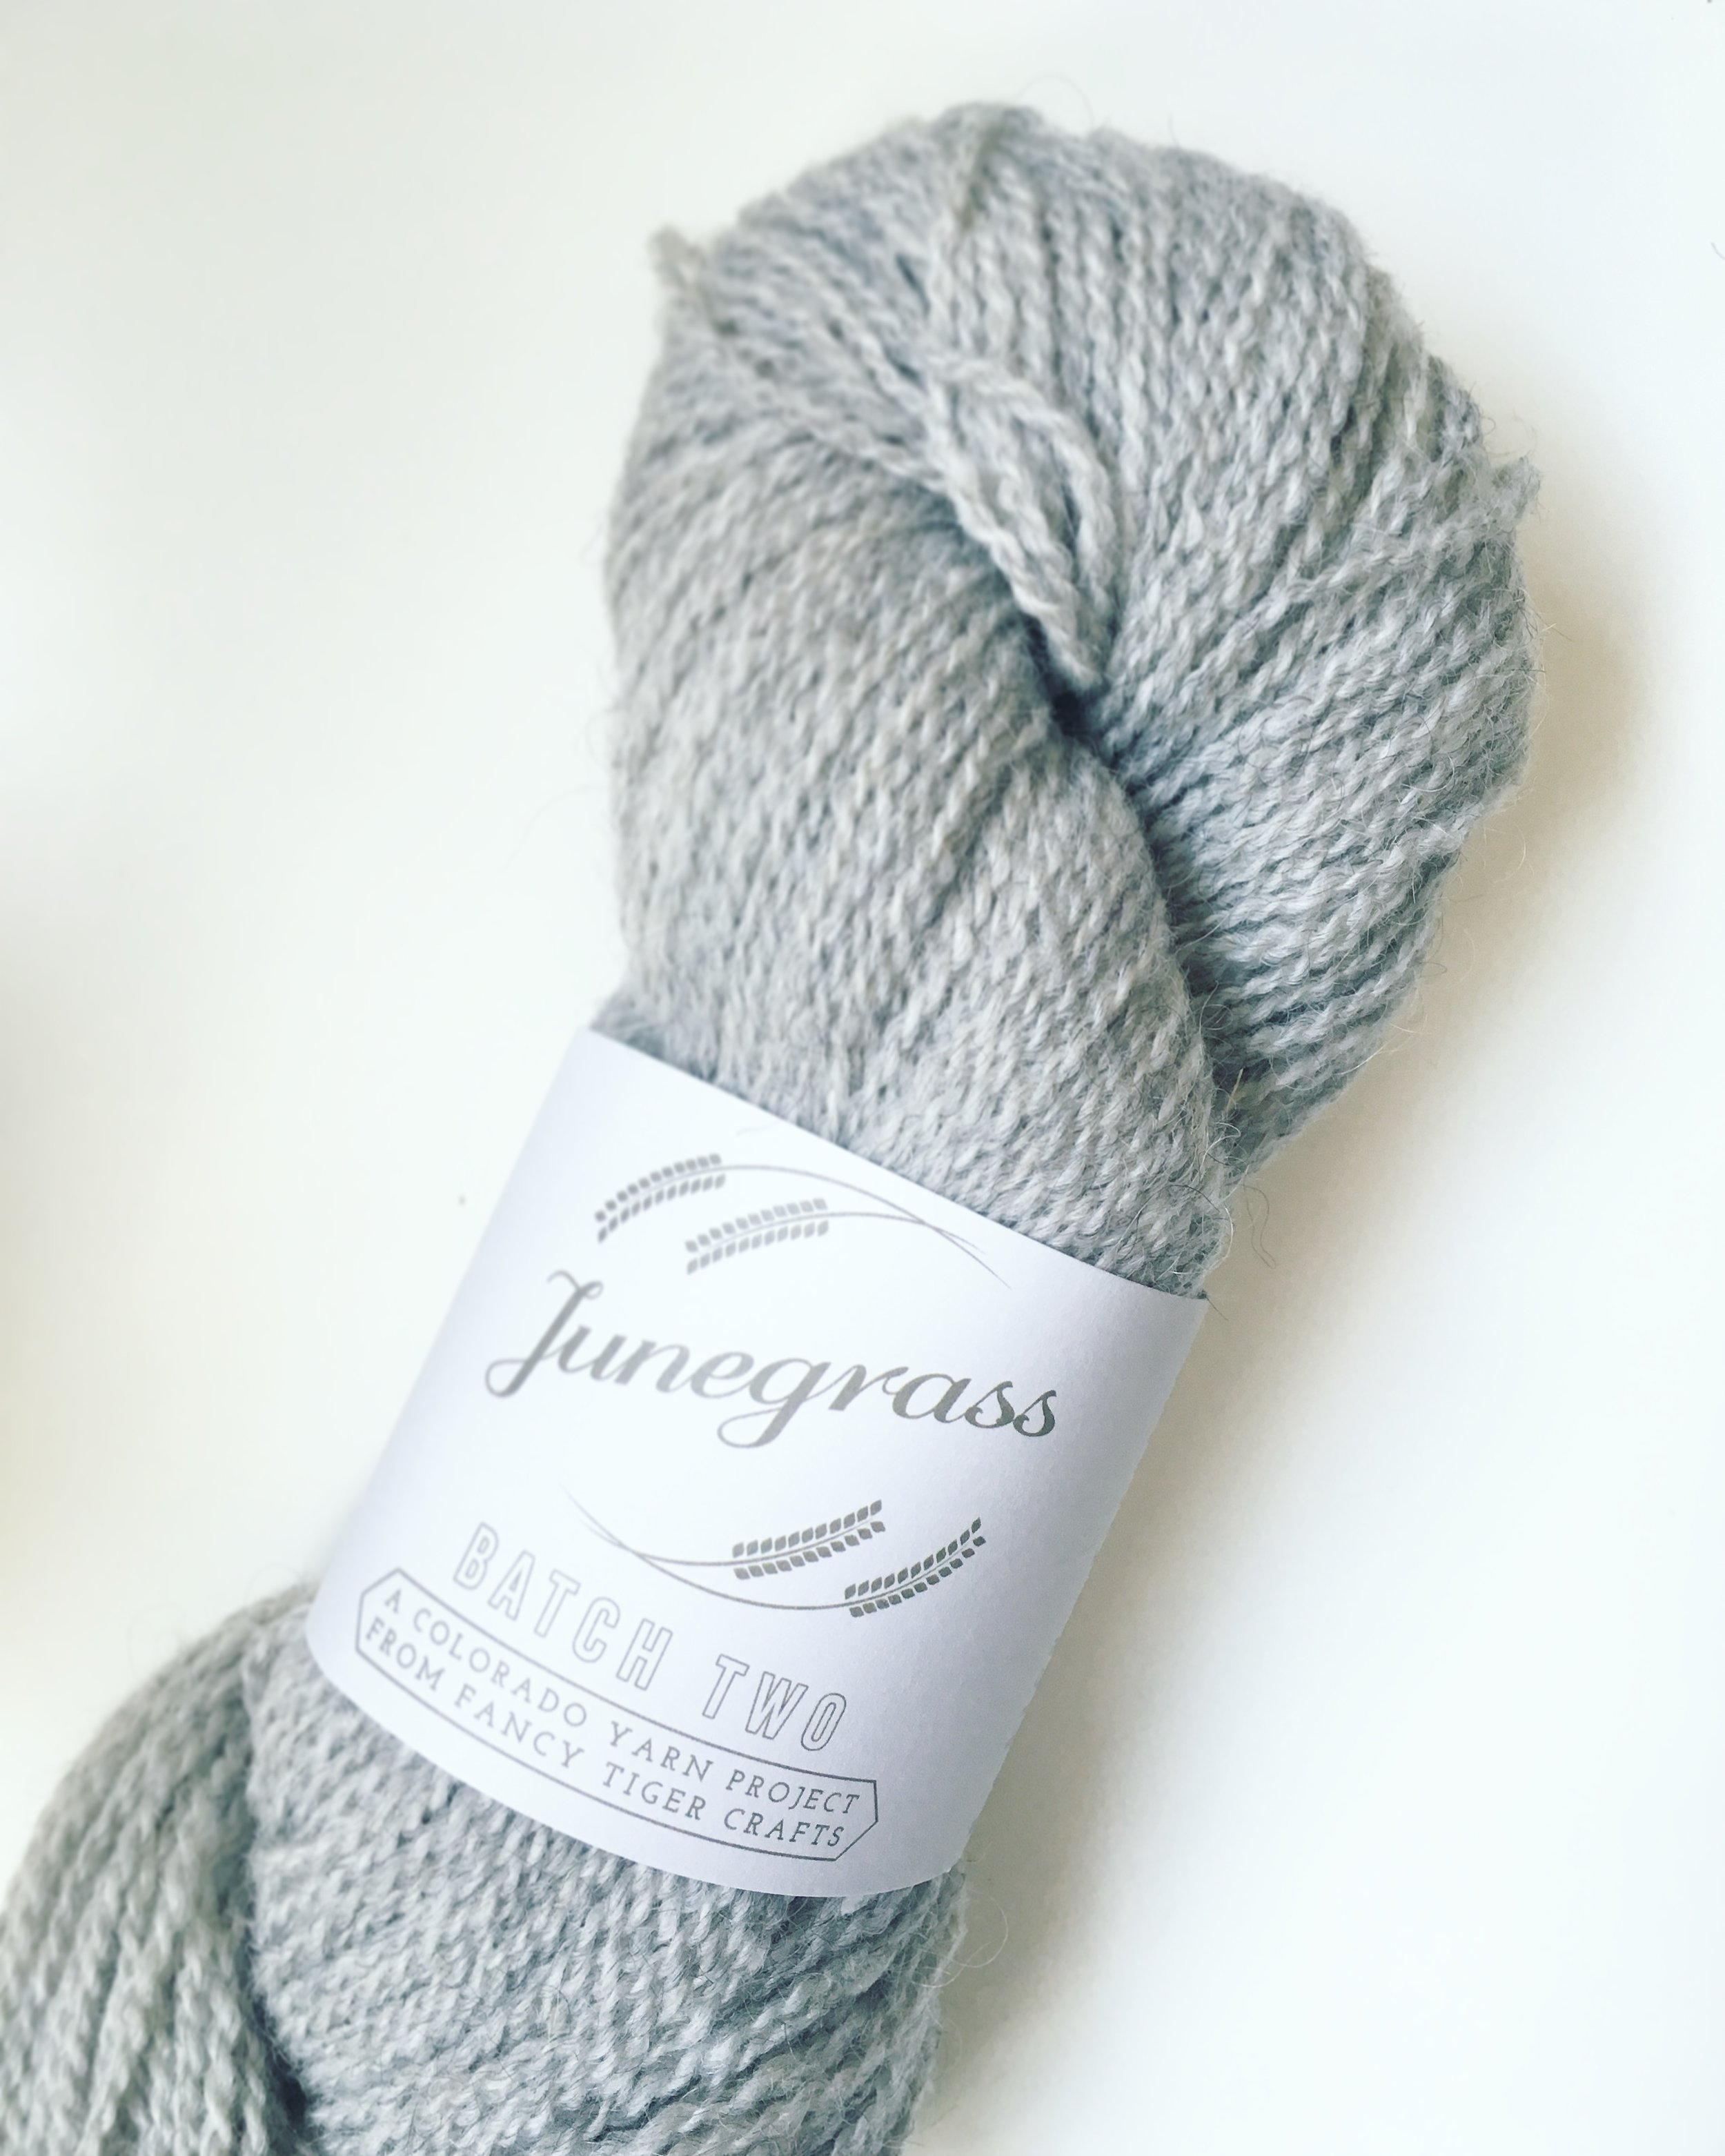 Fancy-tiger_Junegrass2_1.JPG